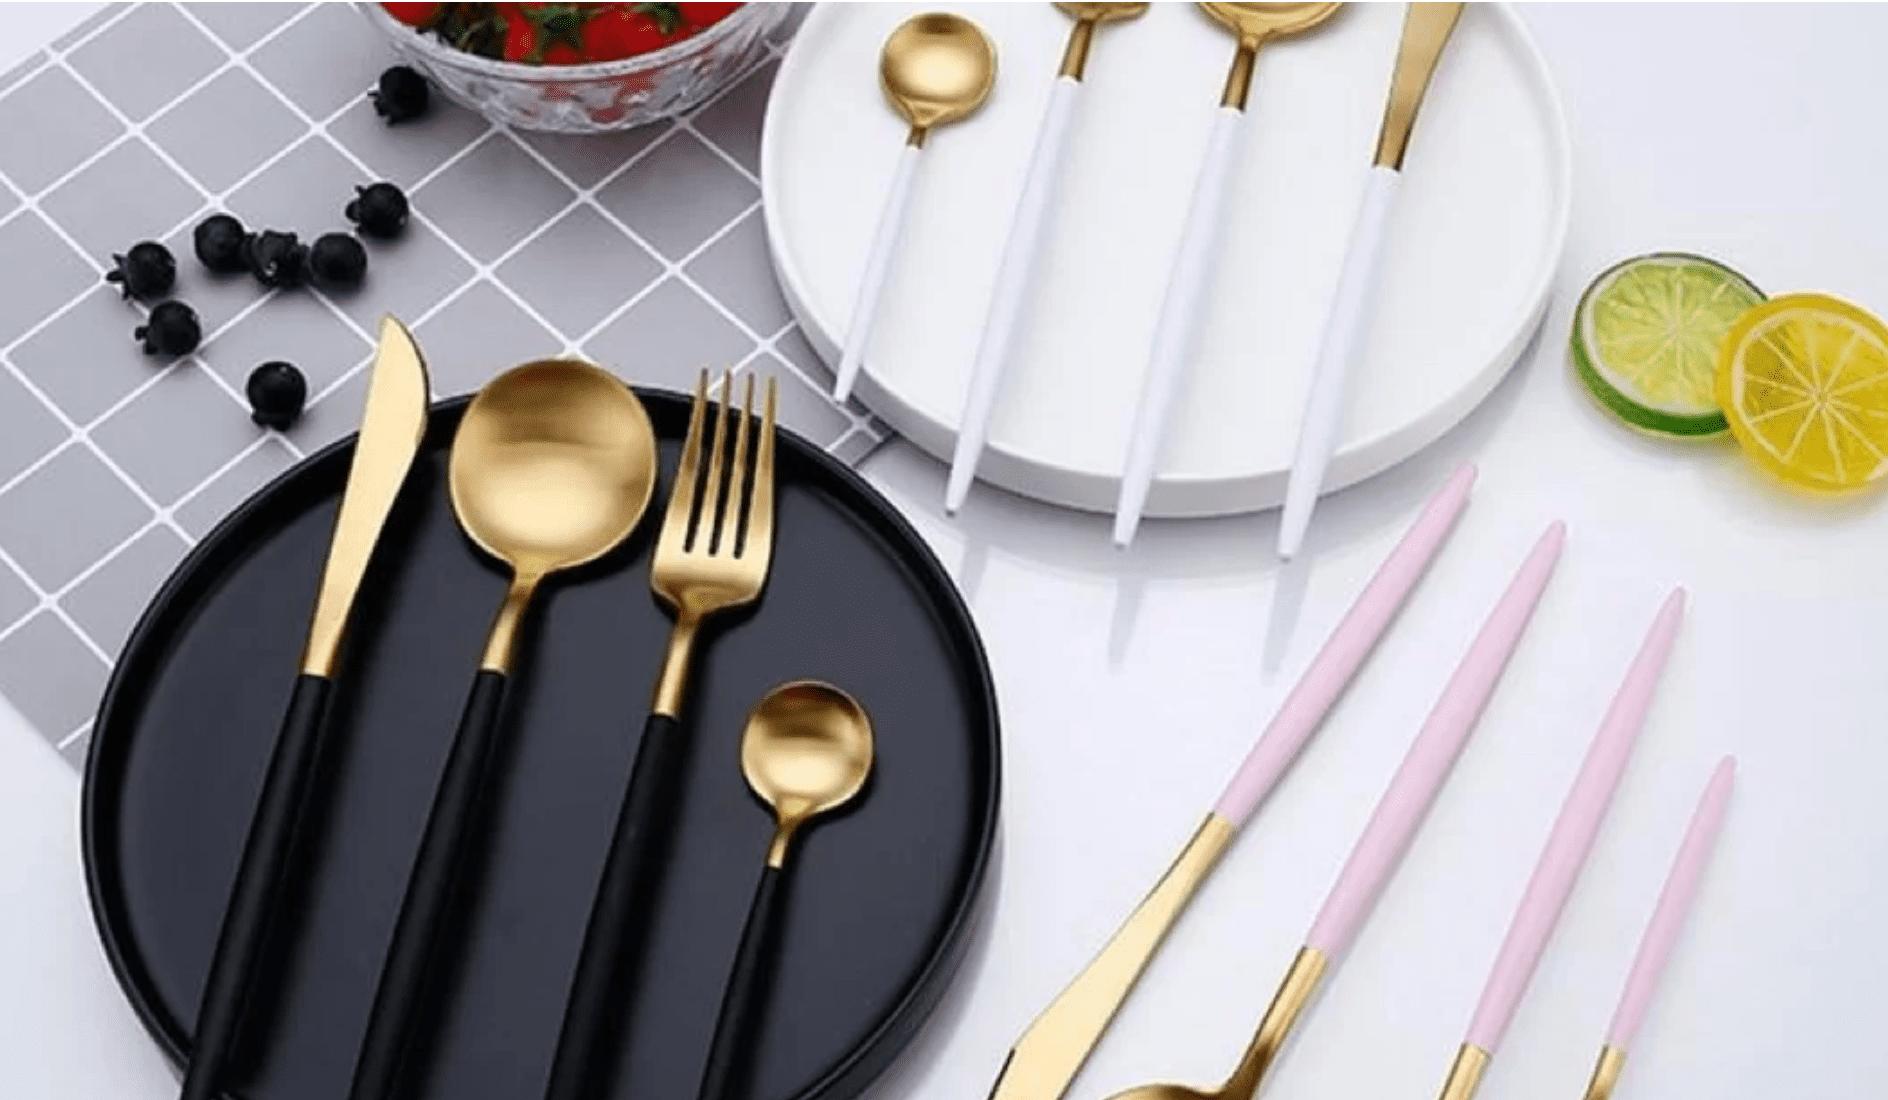 Gold and Matte White Flatware Set